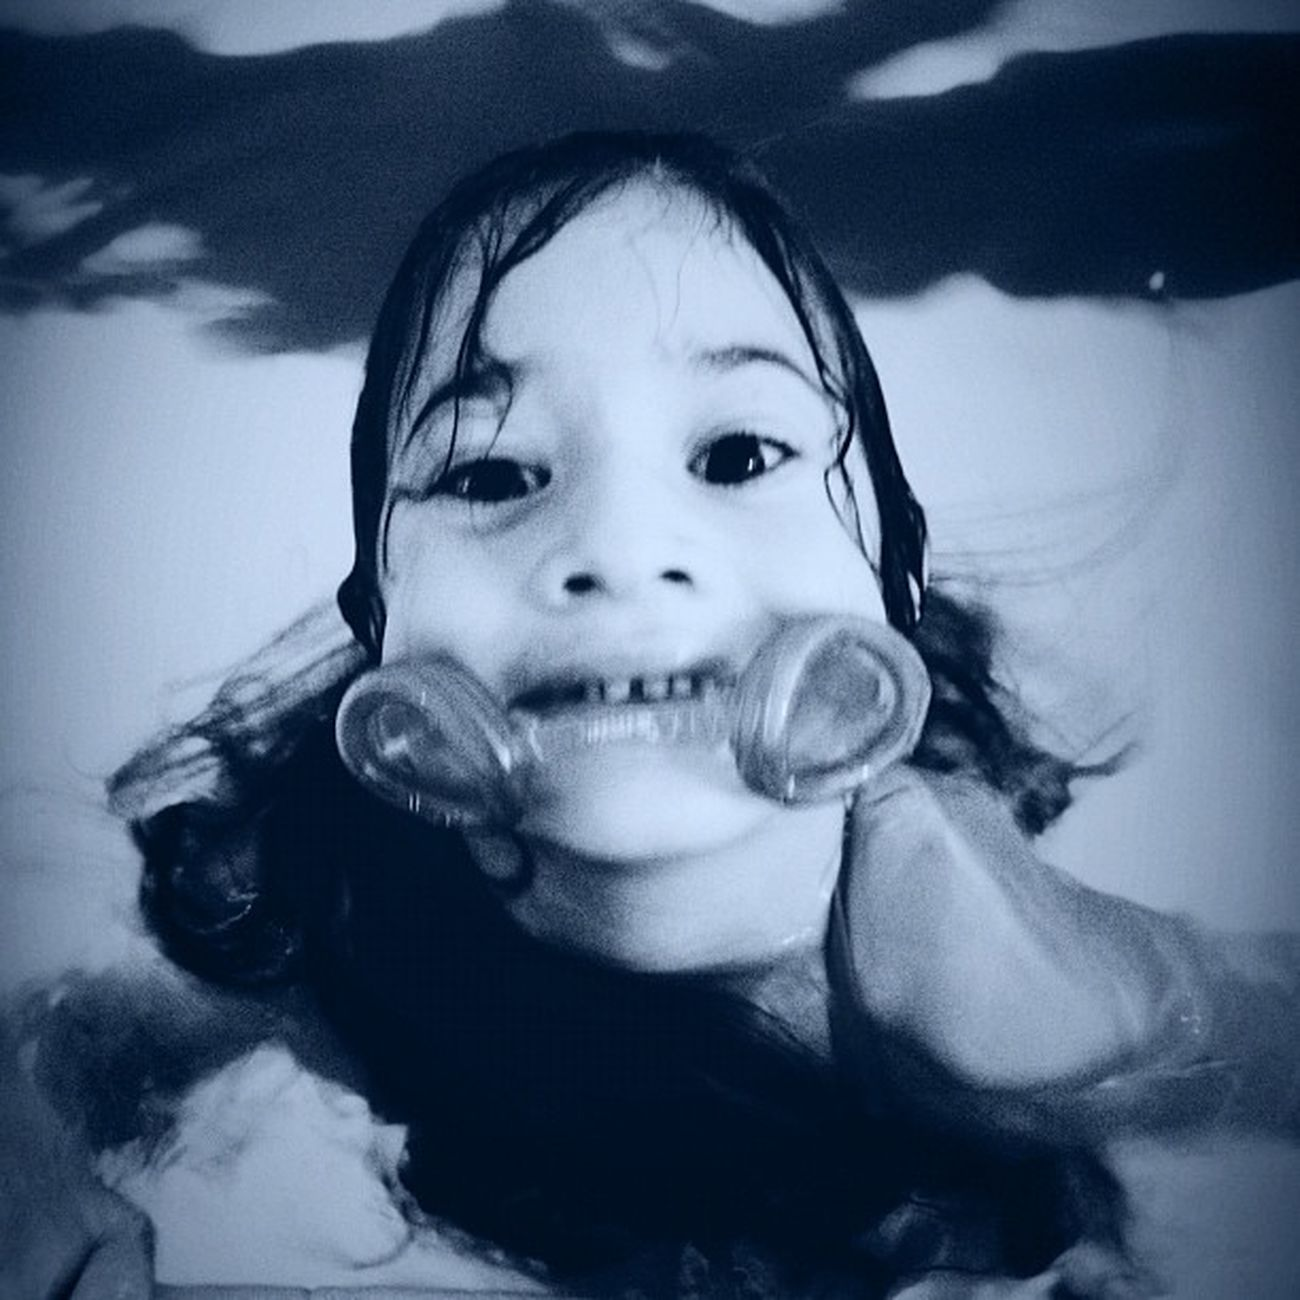 Lorelai at the pool Blackandwhite Swimming Portrait Children Mcallen People